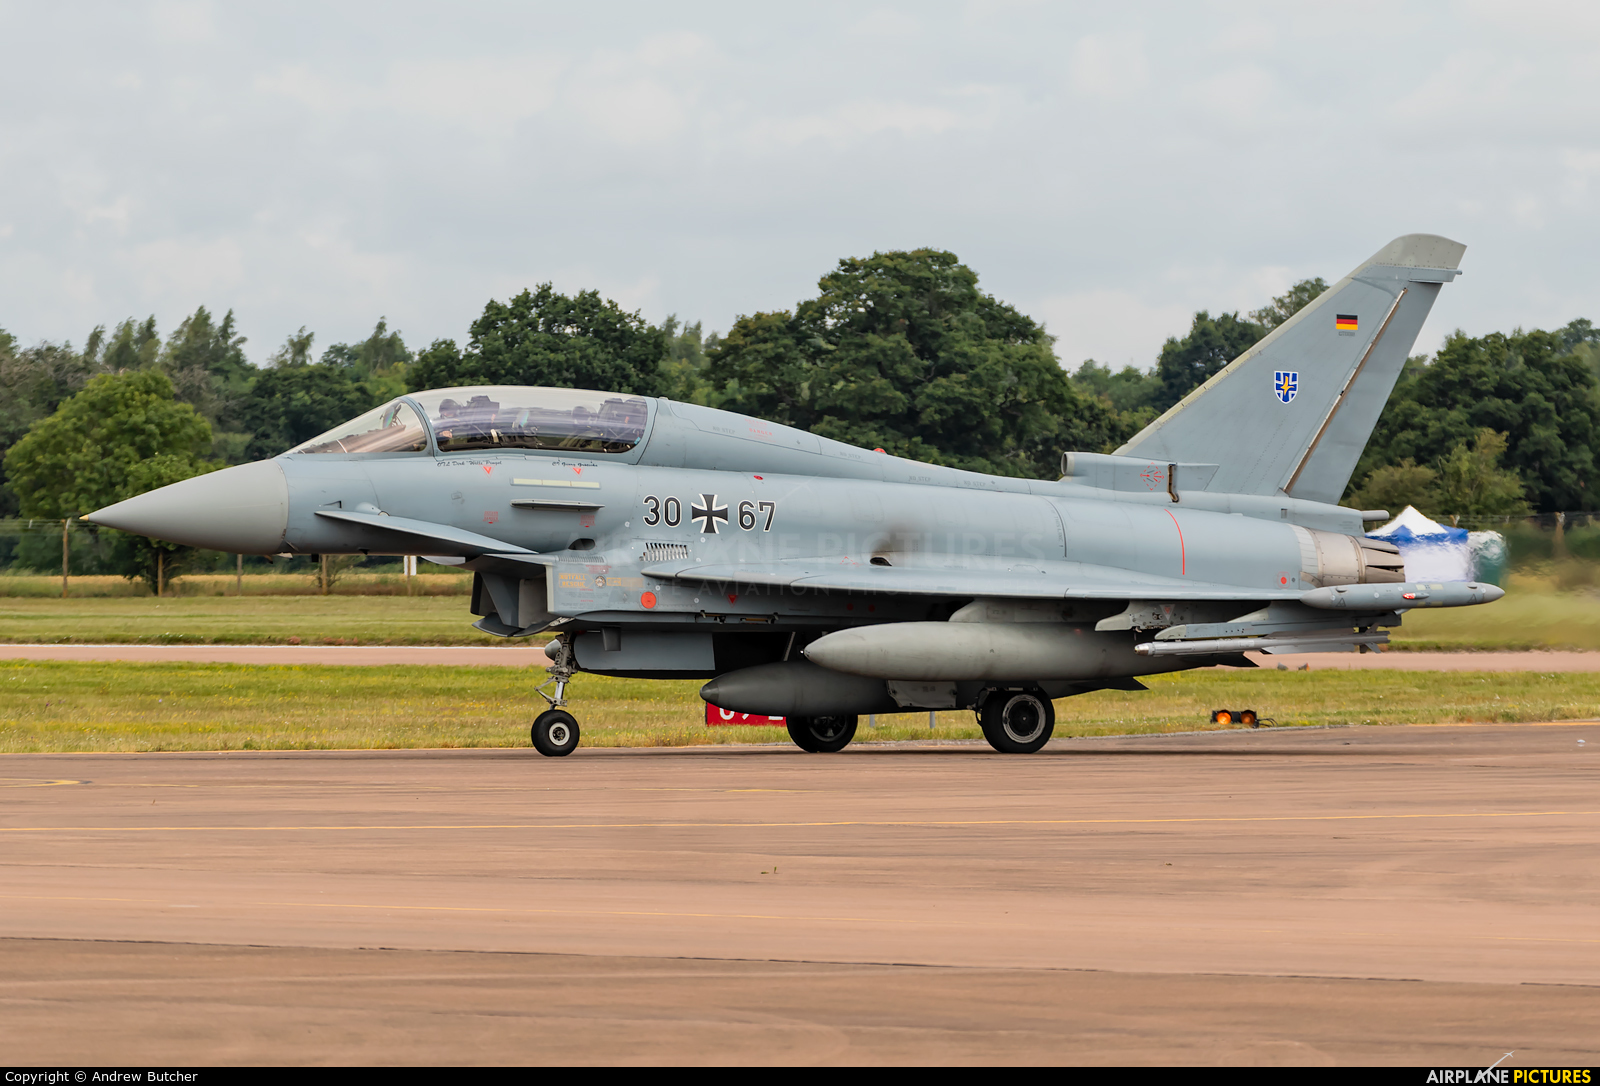 Germany - Air Force 30+67 aircraft at Fairford